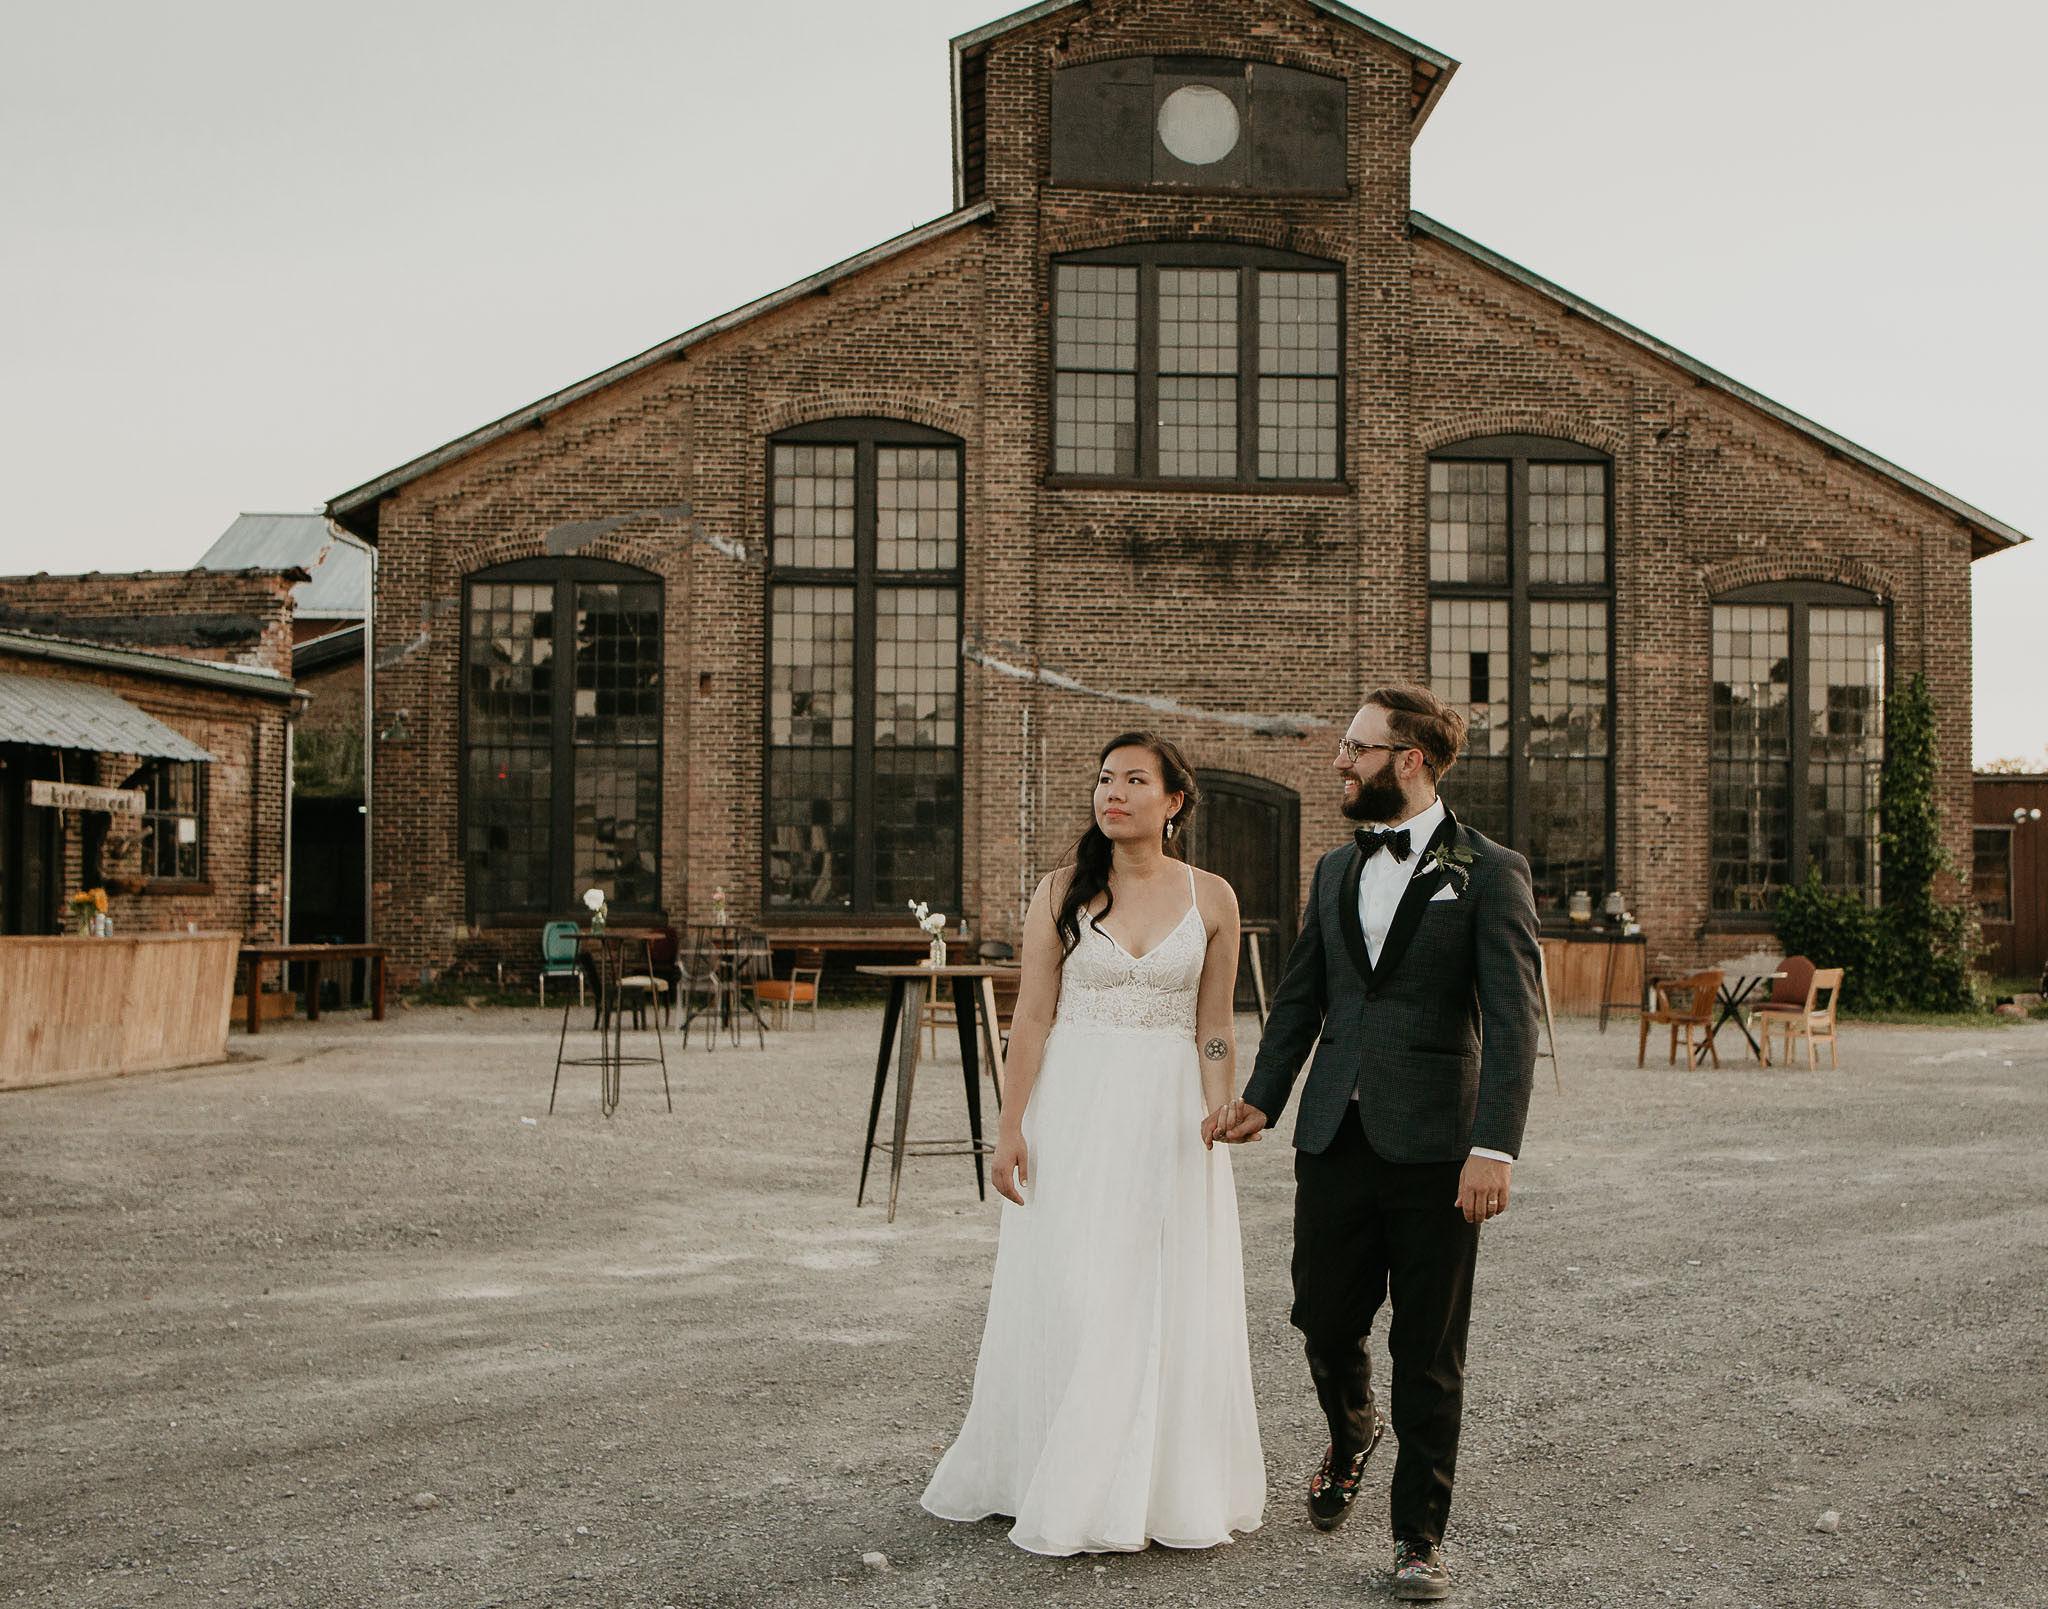 Jess+Matt_wedding-387.JPG